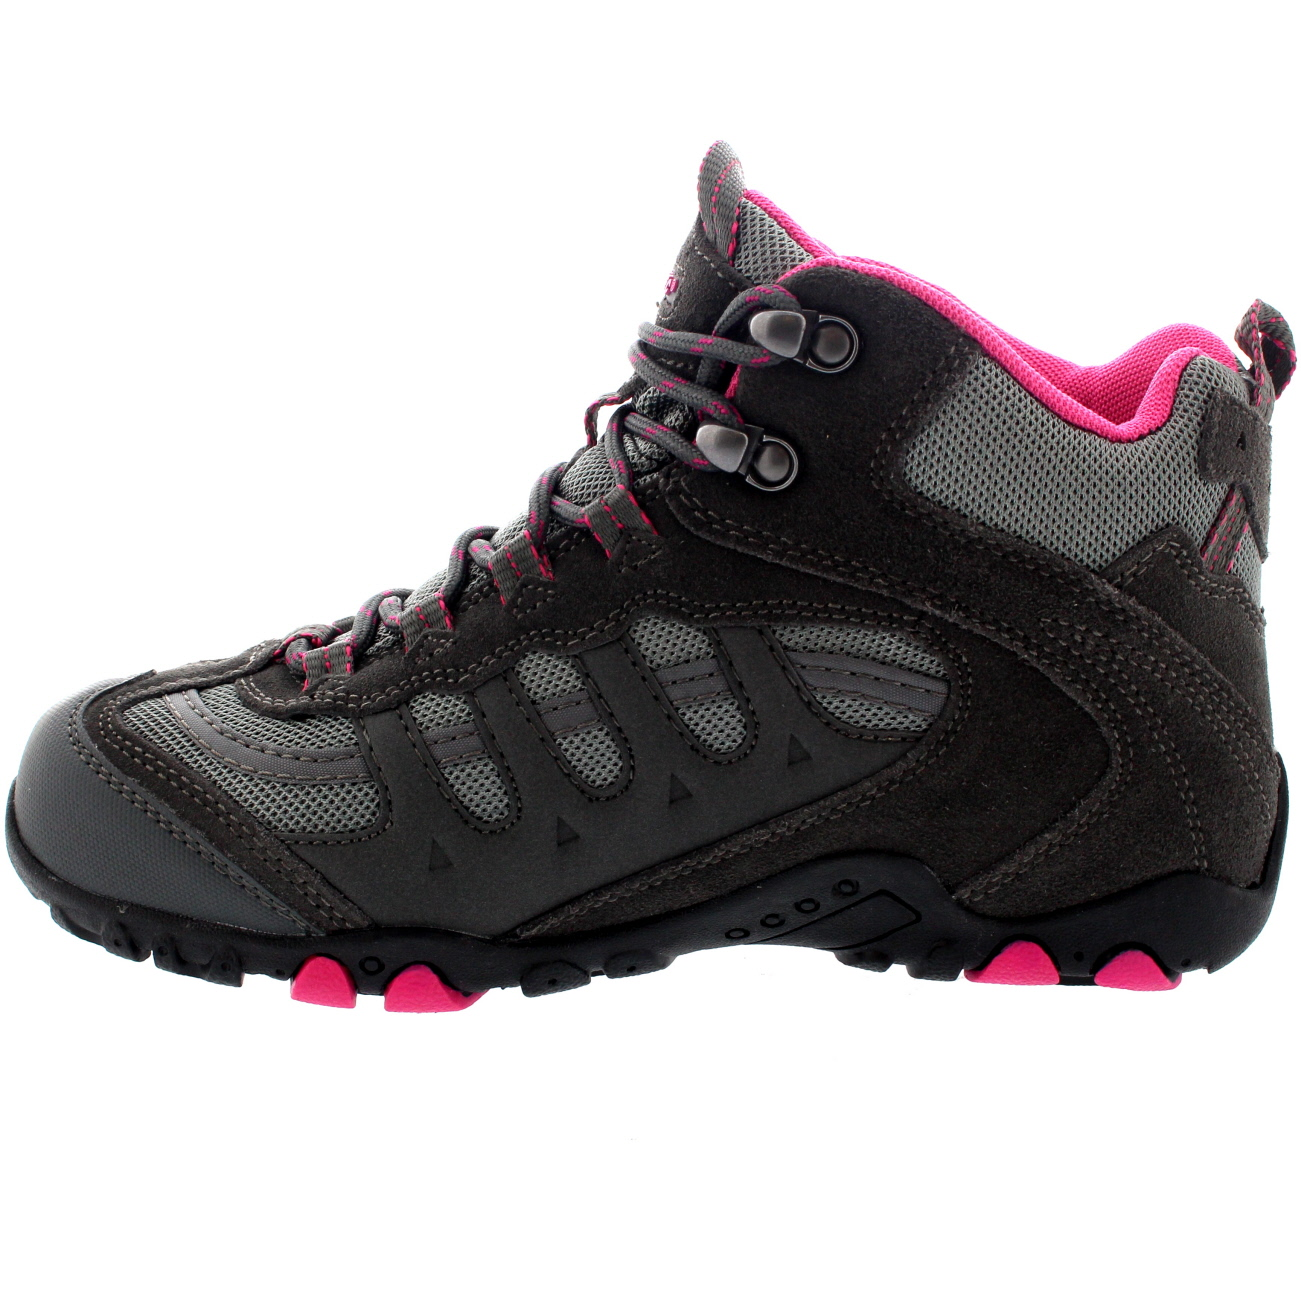 best website 3d672 e994e ... Nike Superfly Elite Track Spikes Volt Pink Pink Pink Multi-color 835996- 999 12 ...